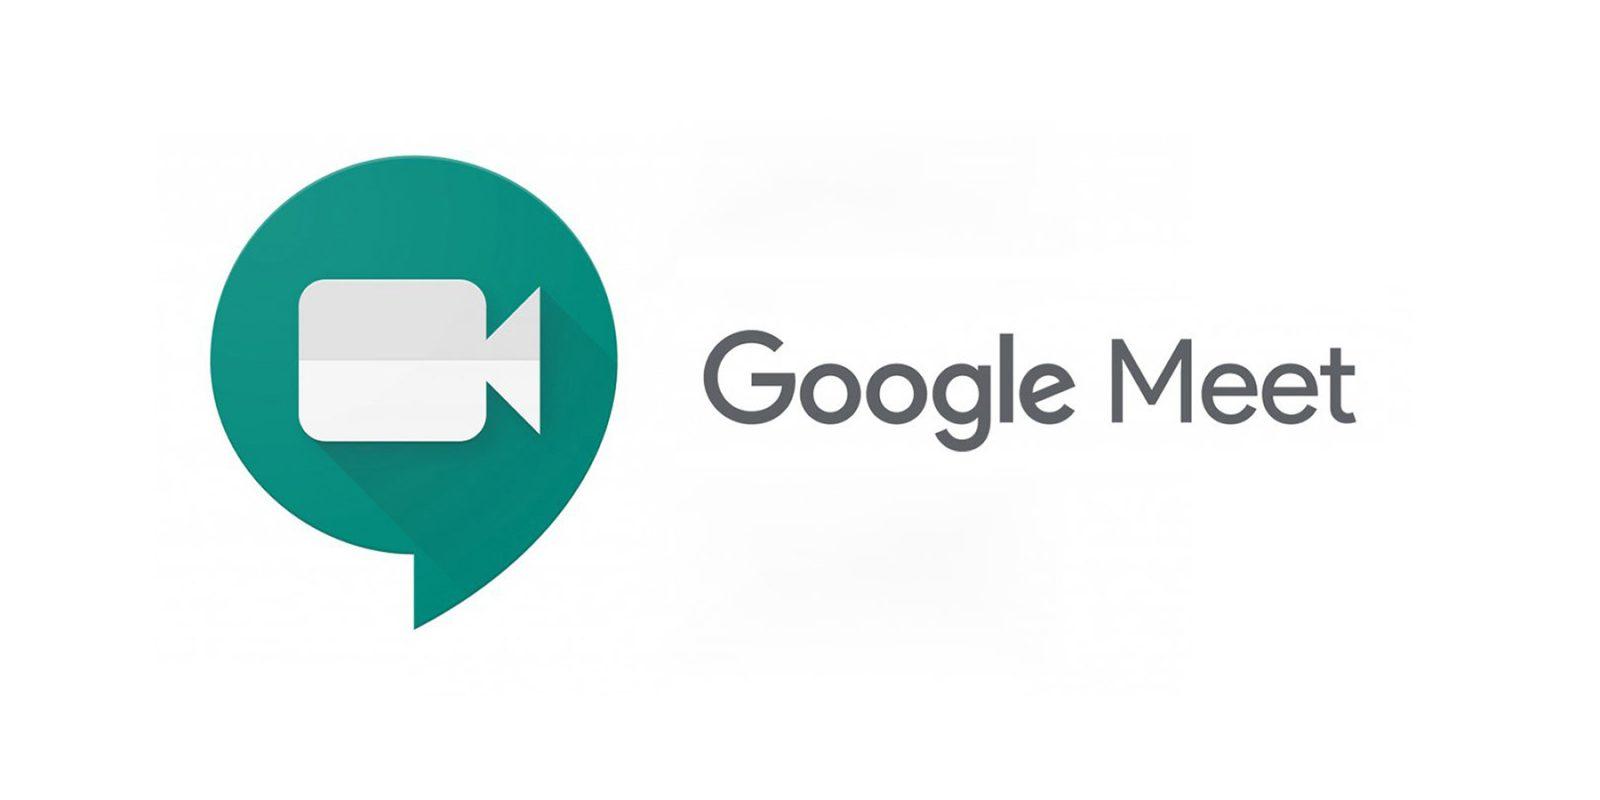 Google Meet - 9to5Google